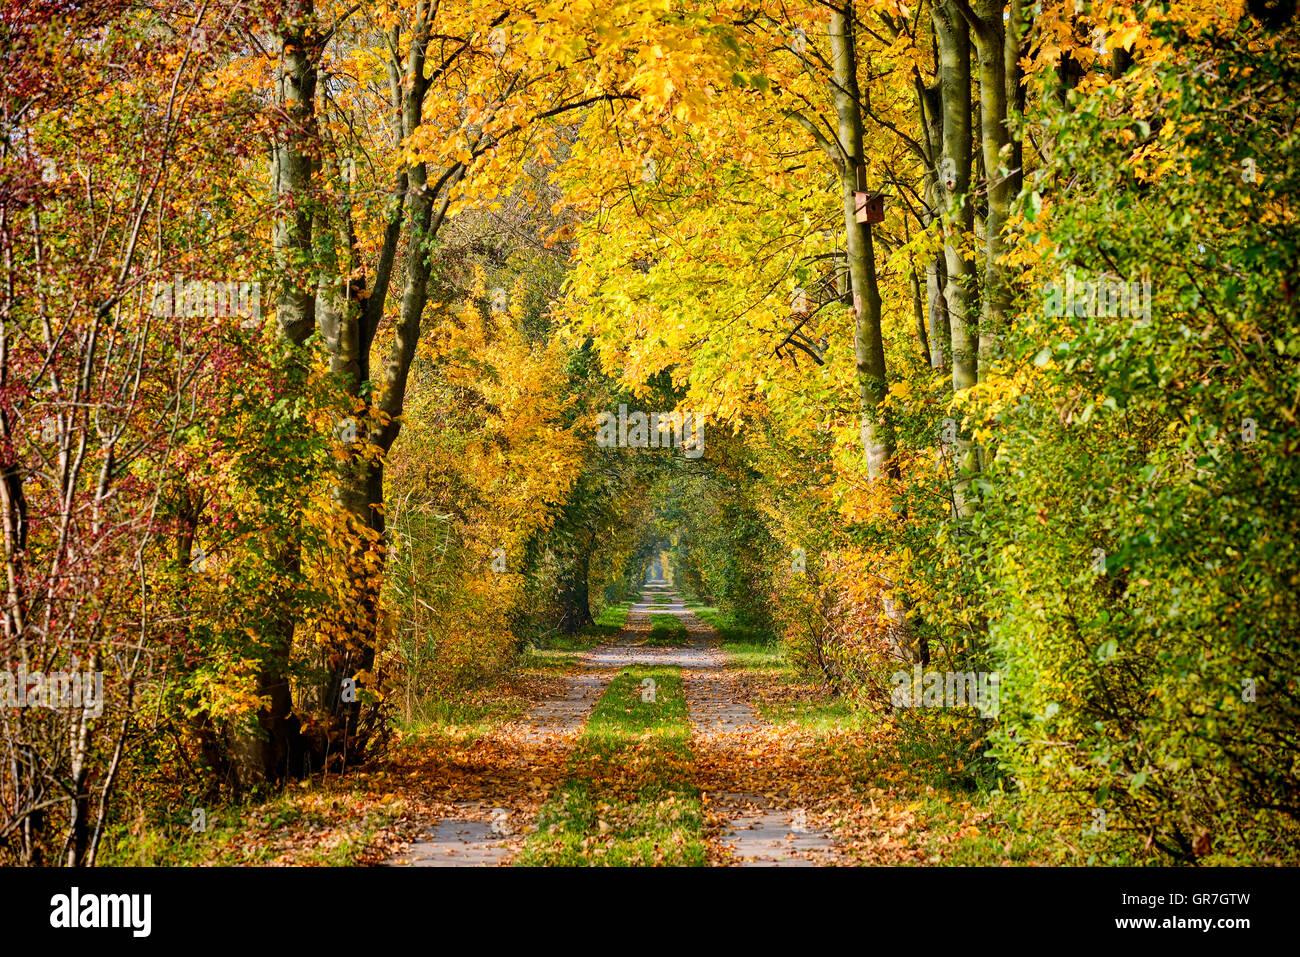 Autumn Trees In Hamburg, Germany - Stock Image